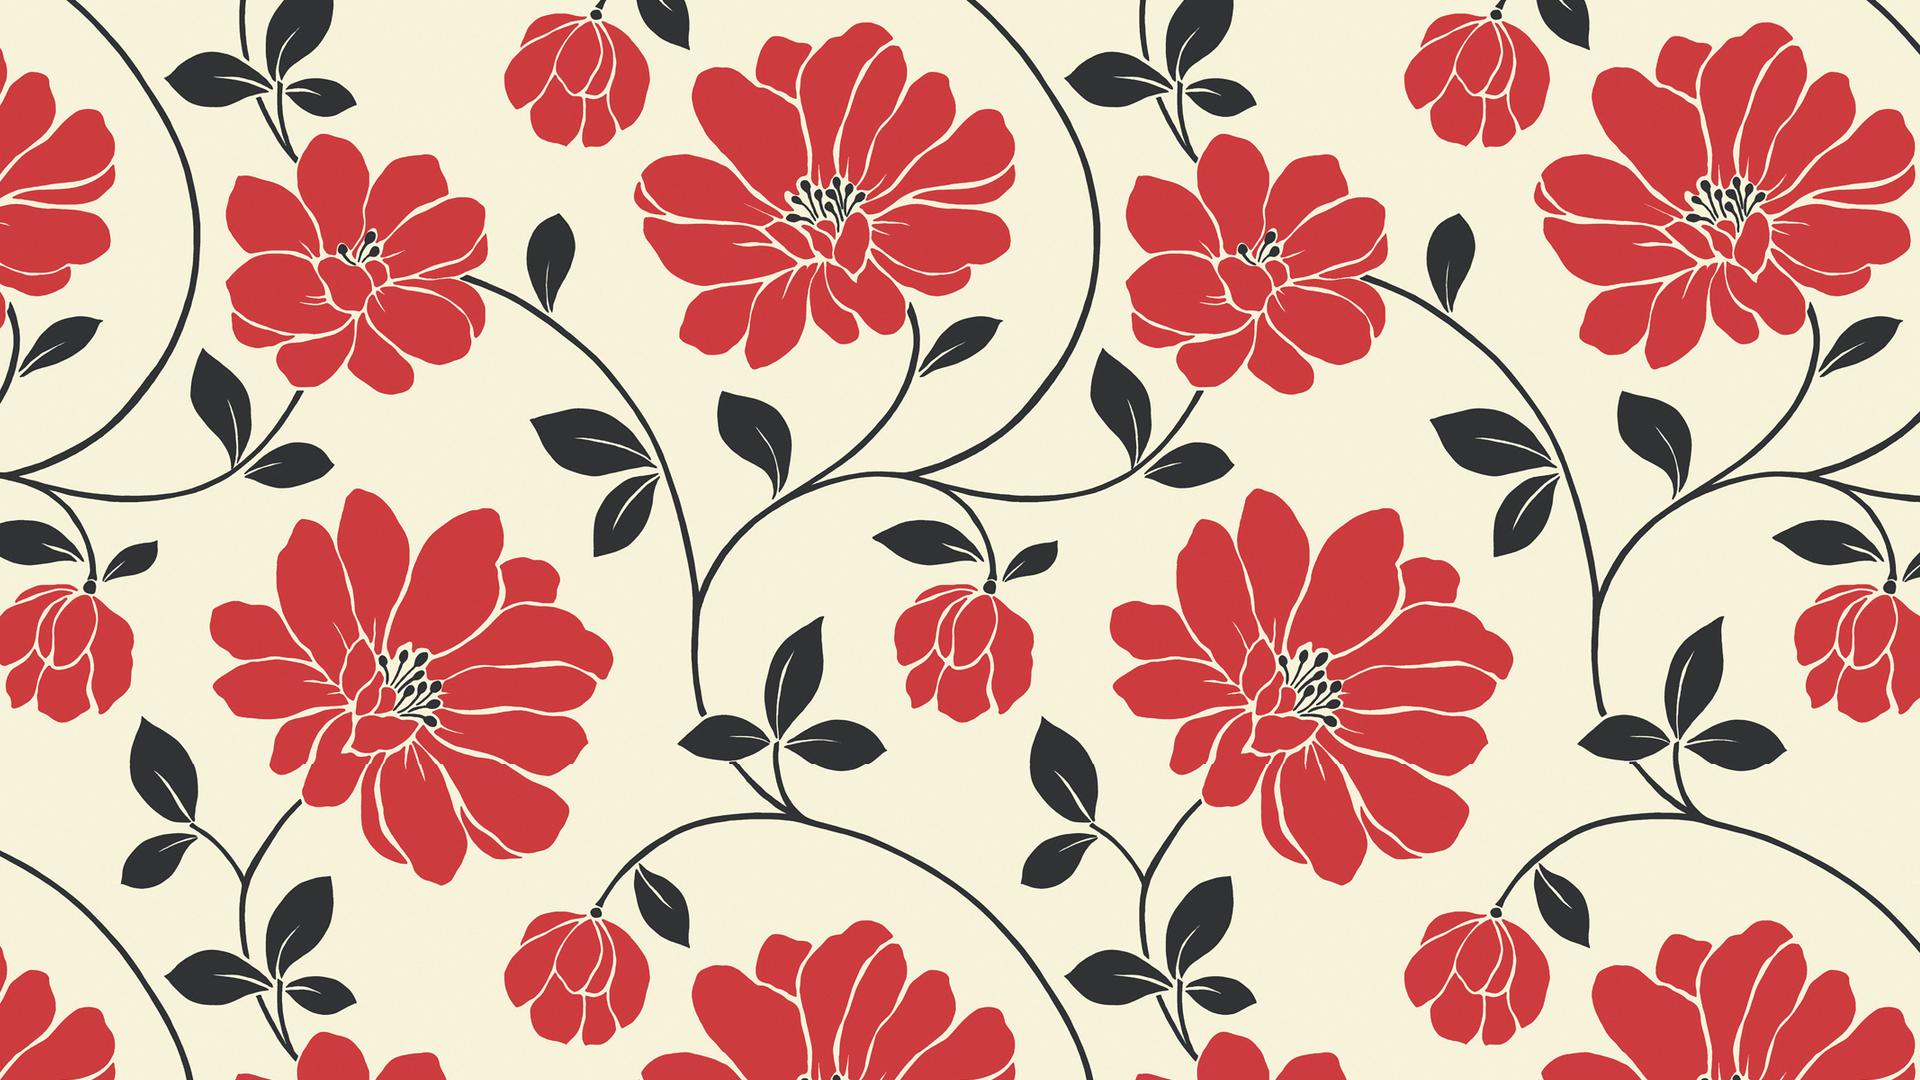 Free Download 37 Flower Wallpaper Tumblr Id613bhi Atgbcentralcom